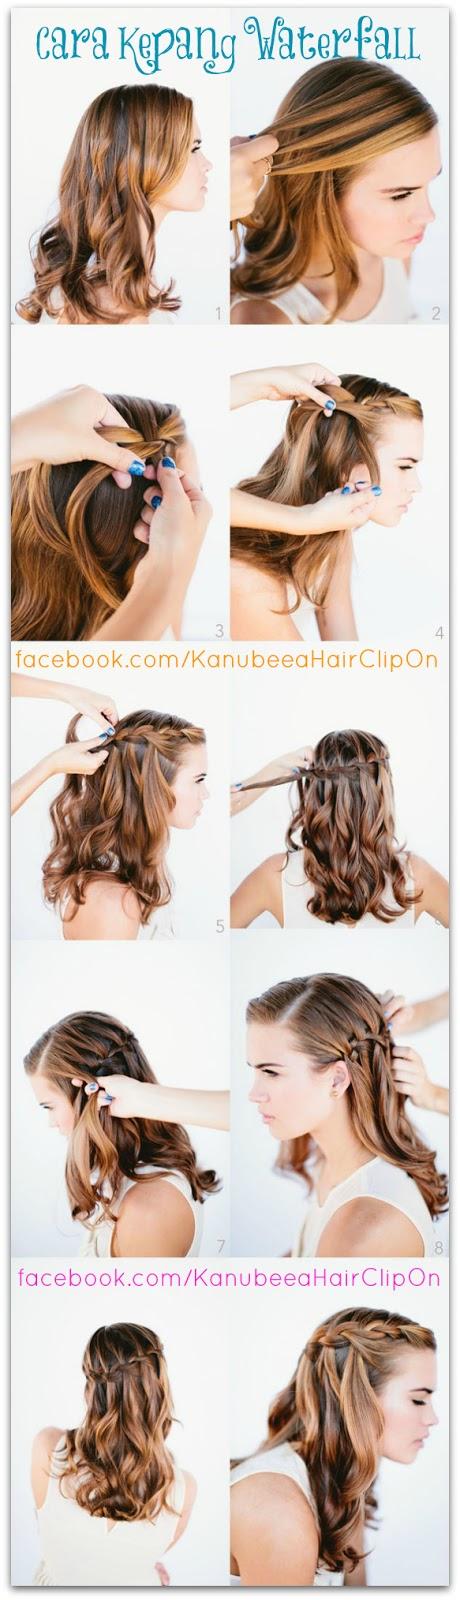 Kanubeea Hair Clip: Cara Mudah Kepang Waterfall